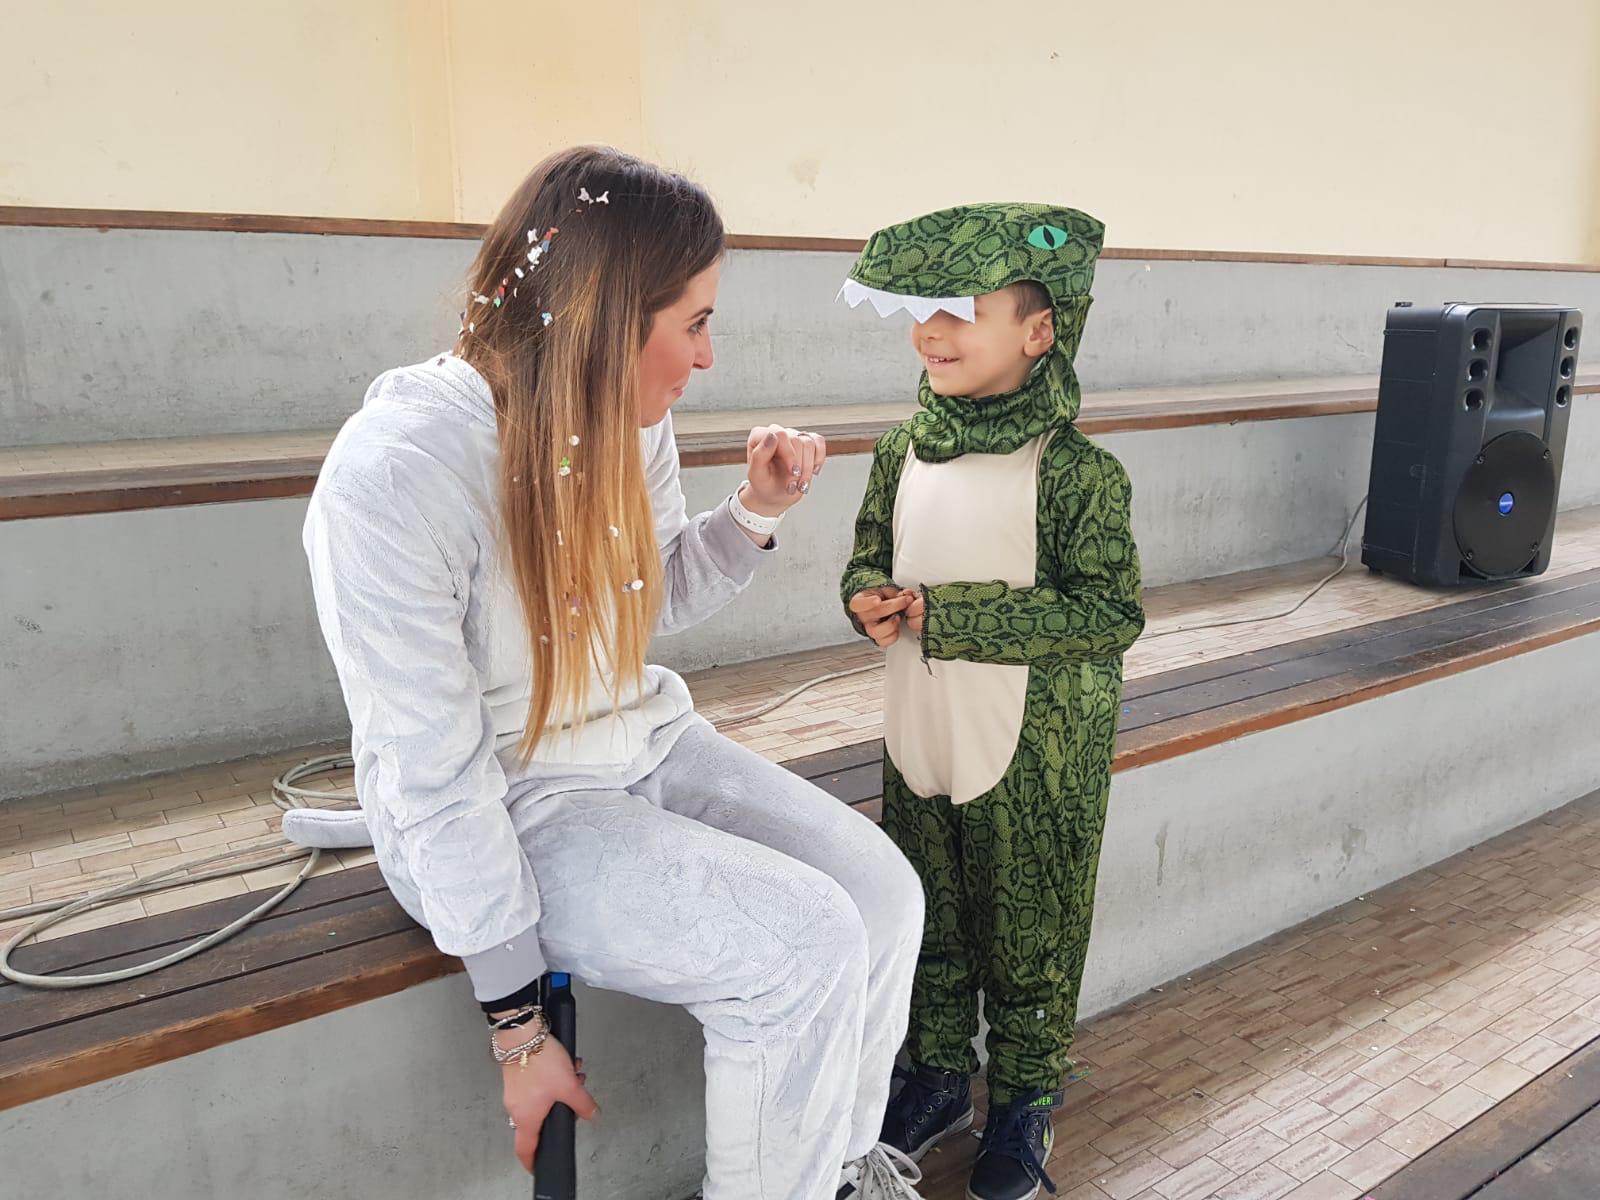 Baraonda Carnevale 2019 (34)